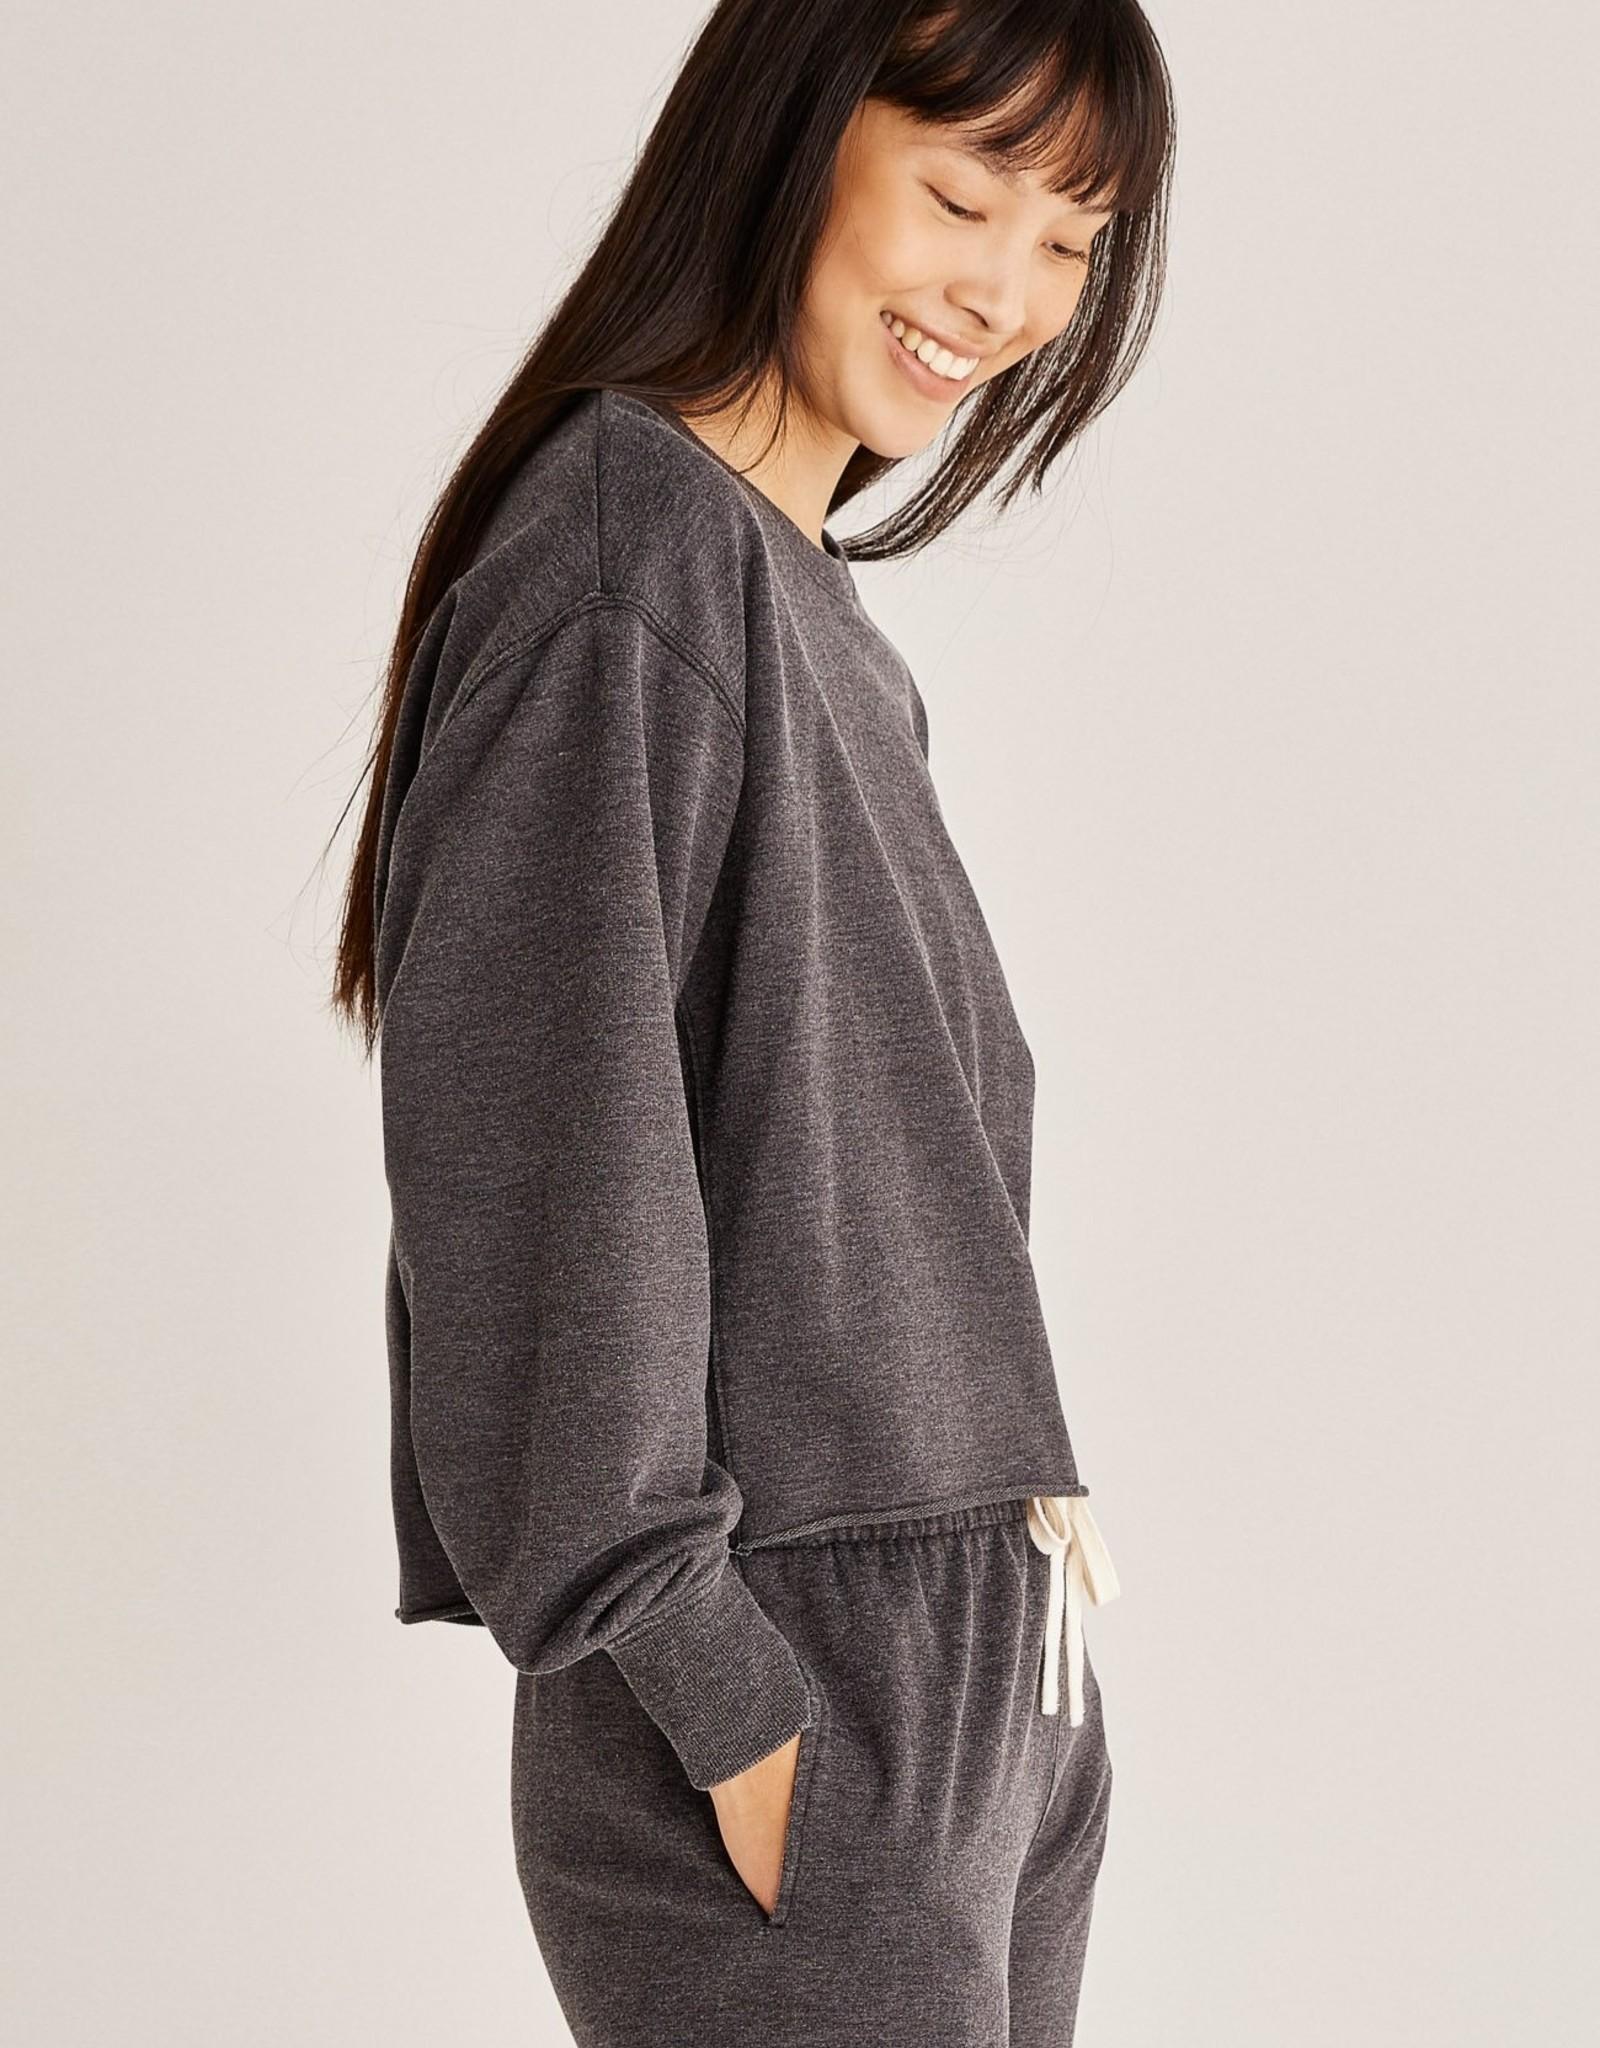 Z Supply Claire Boxy Sweatshirt